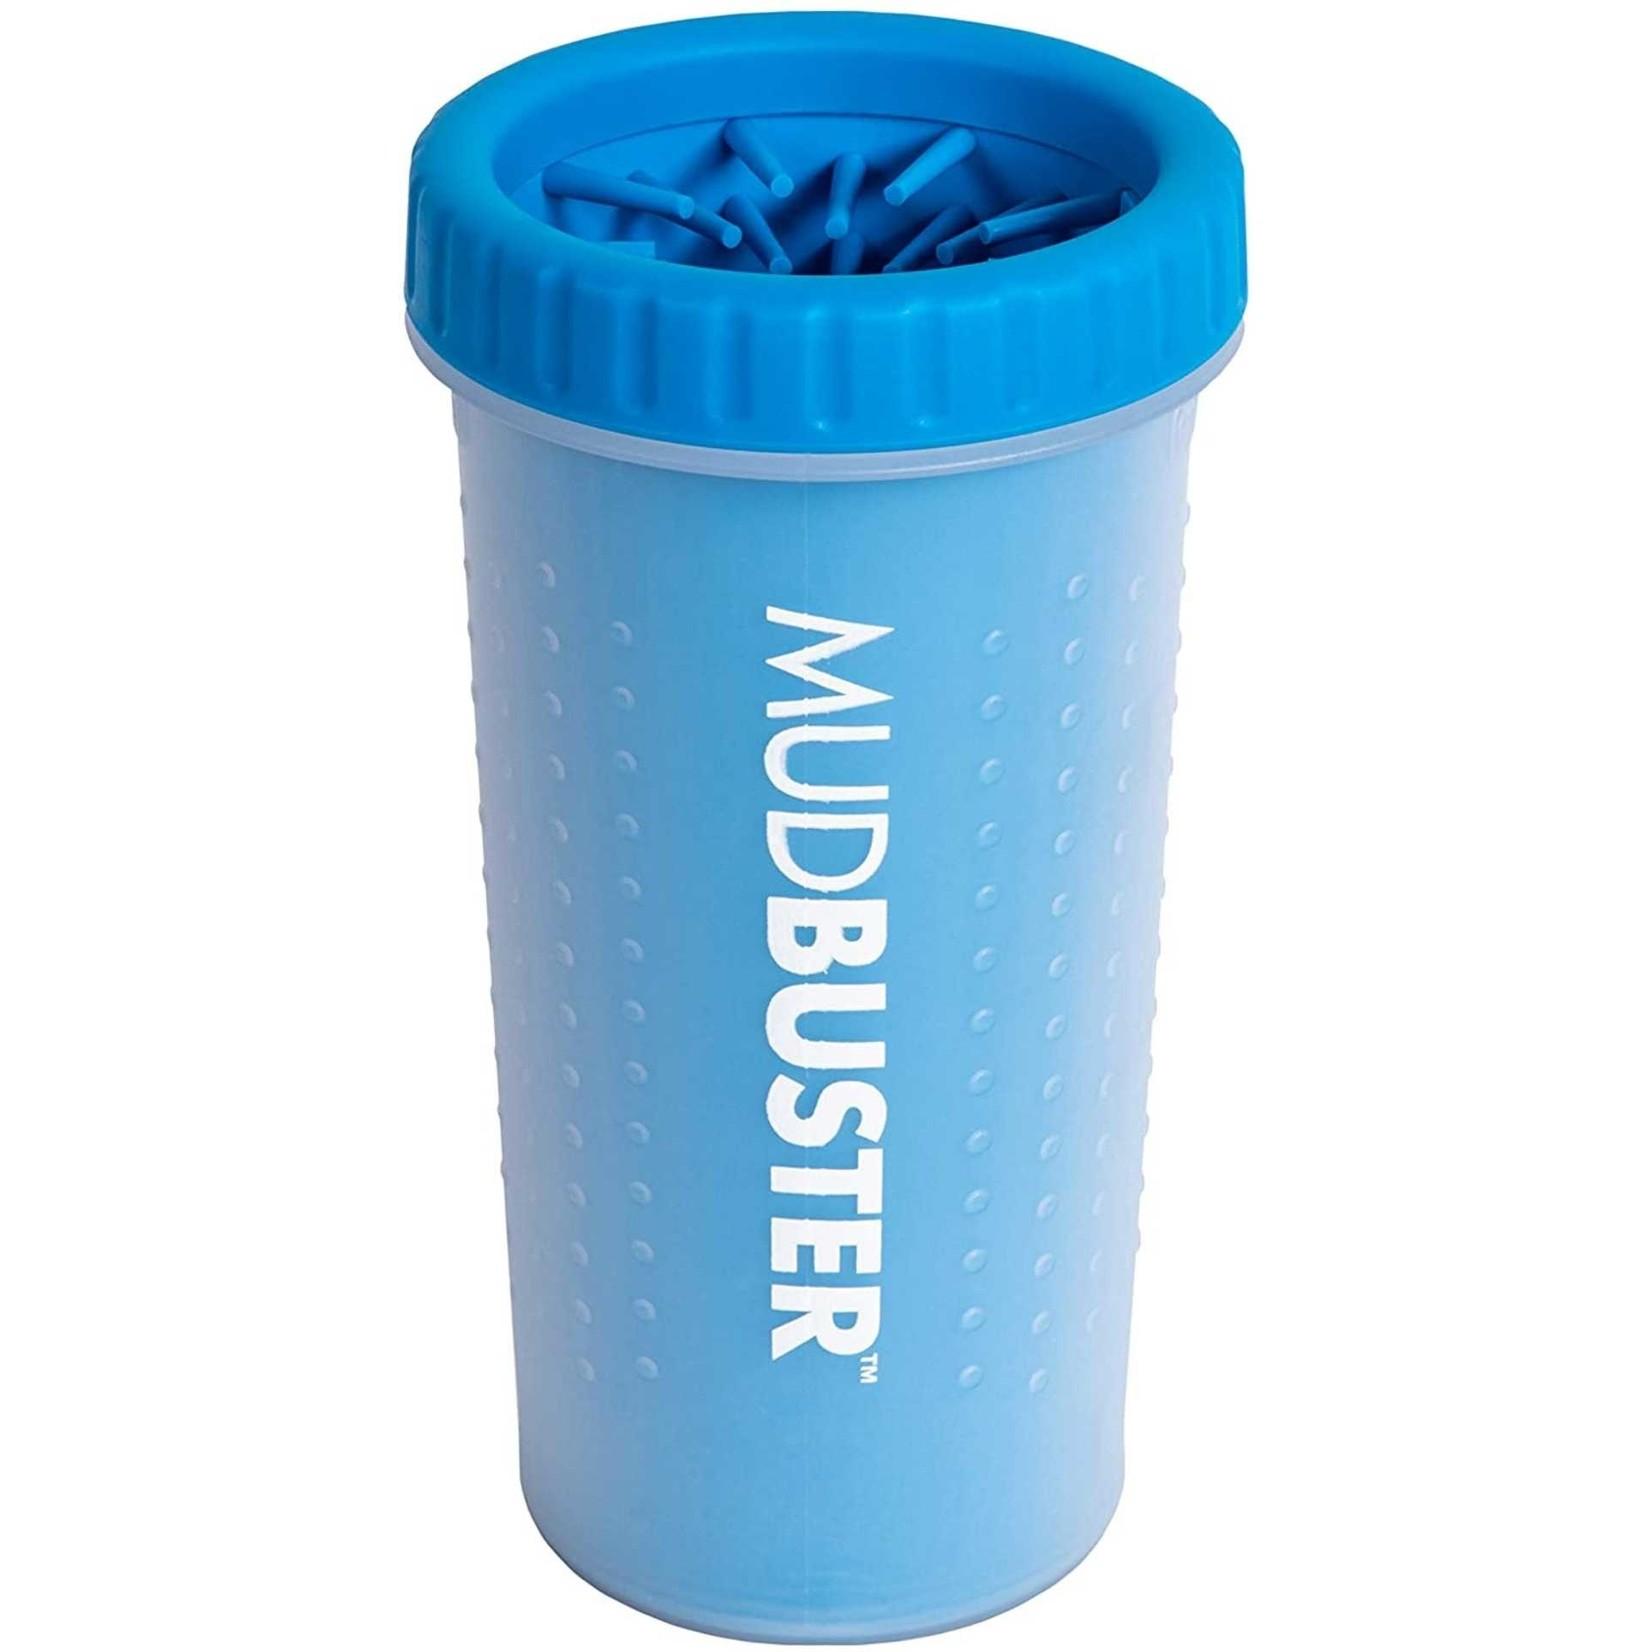 Dexas Mudbuster pro blue